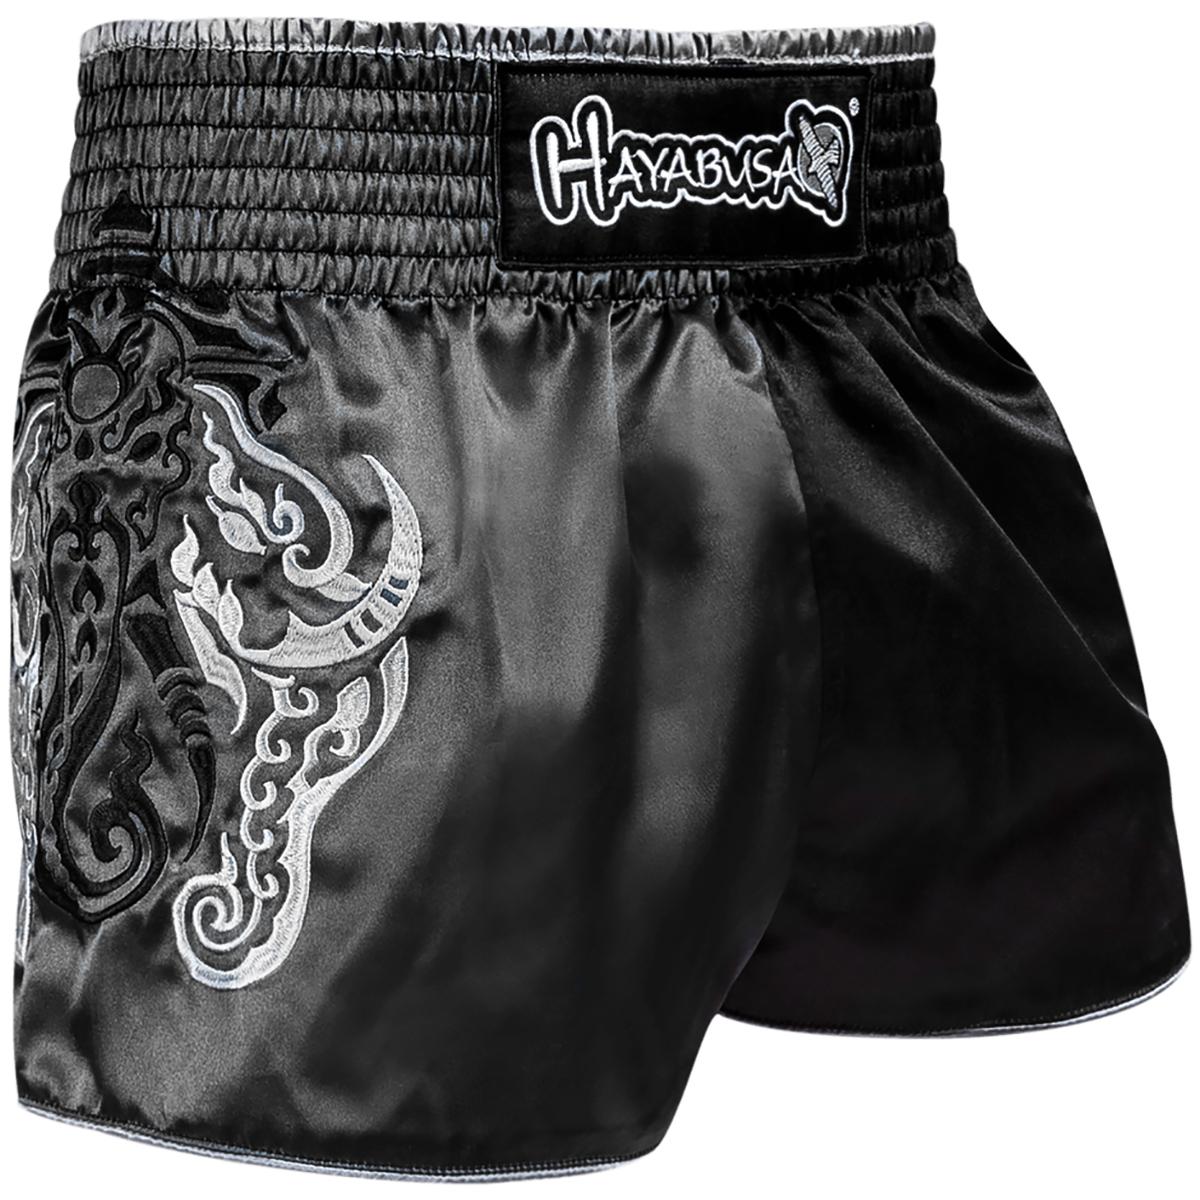 Hayabusa-Wisdom-Muay-Thai-Fight-Shorts miniature 6